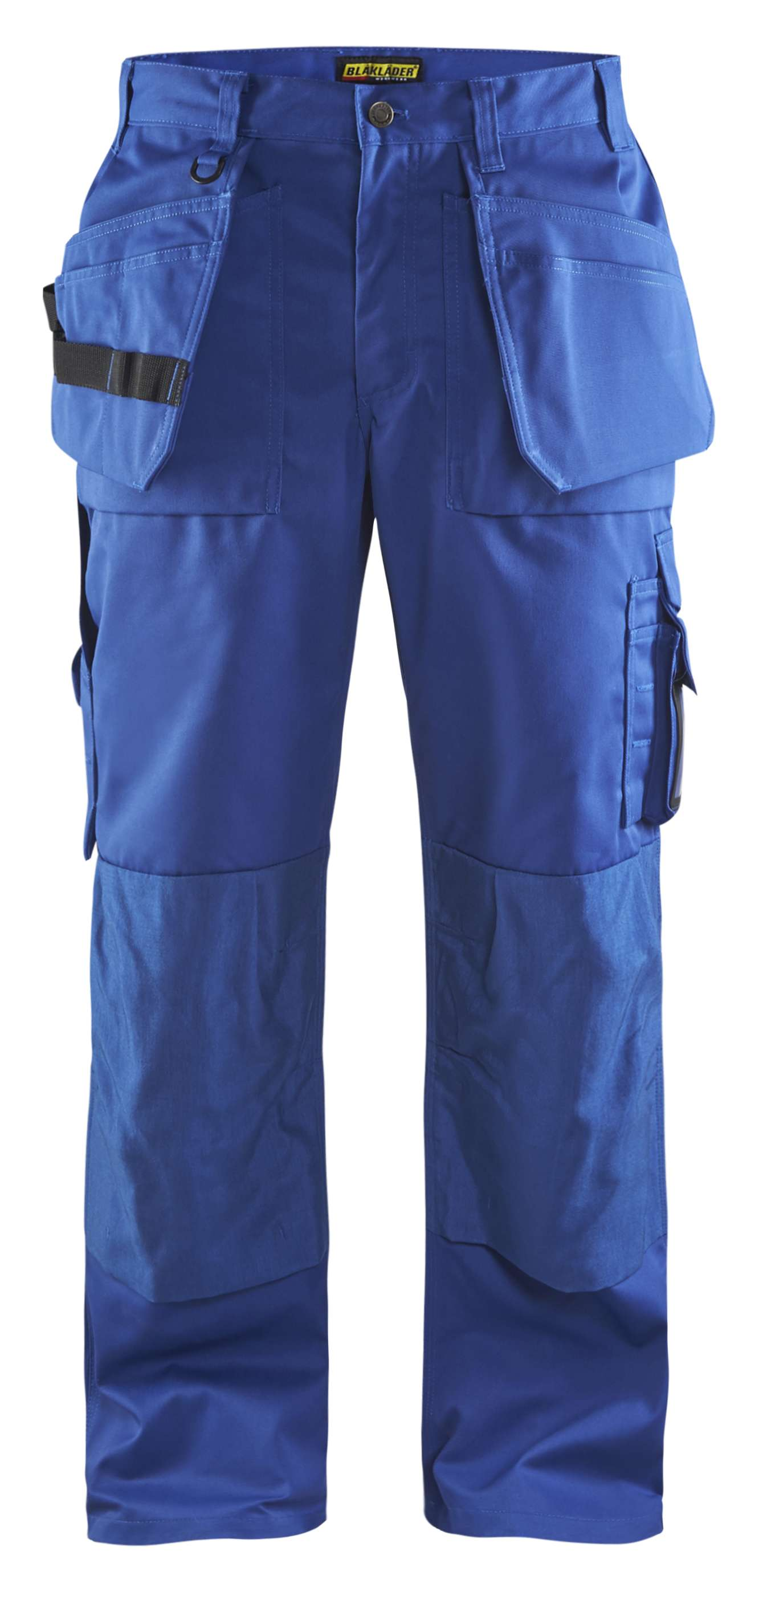 Blaklader Werkbroeken 15301860 korenblauw(8500)